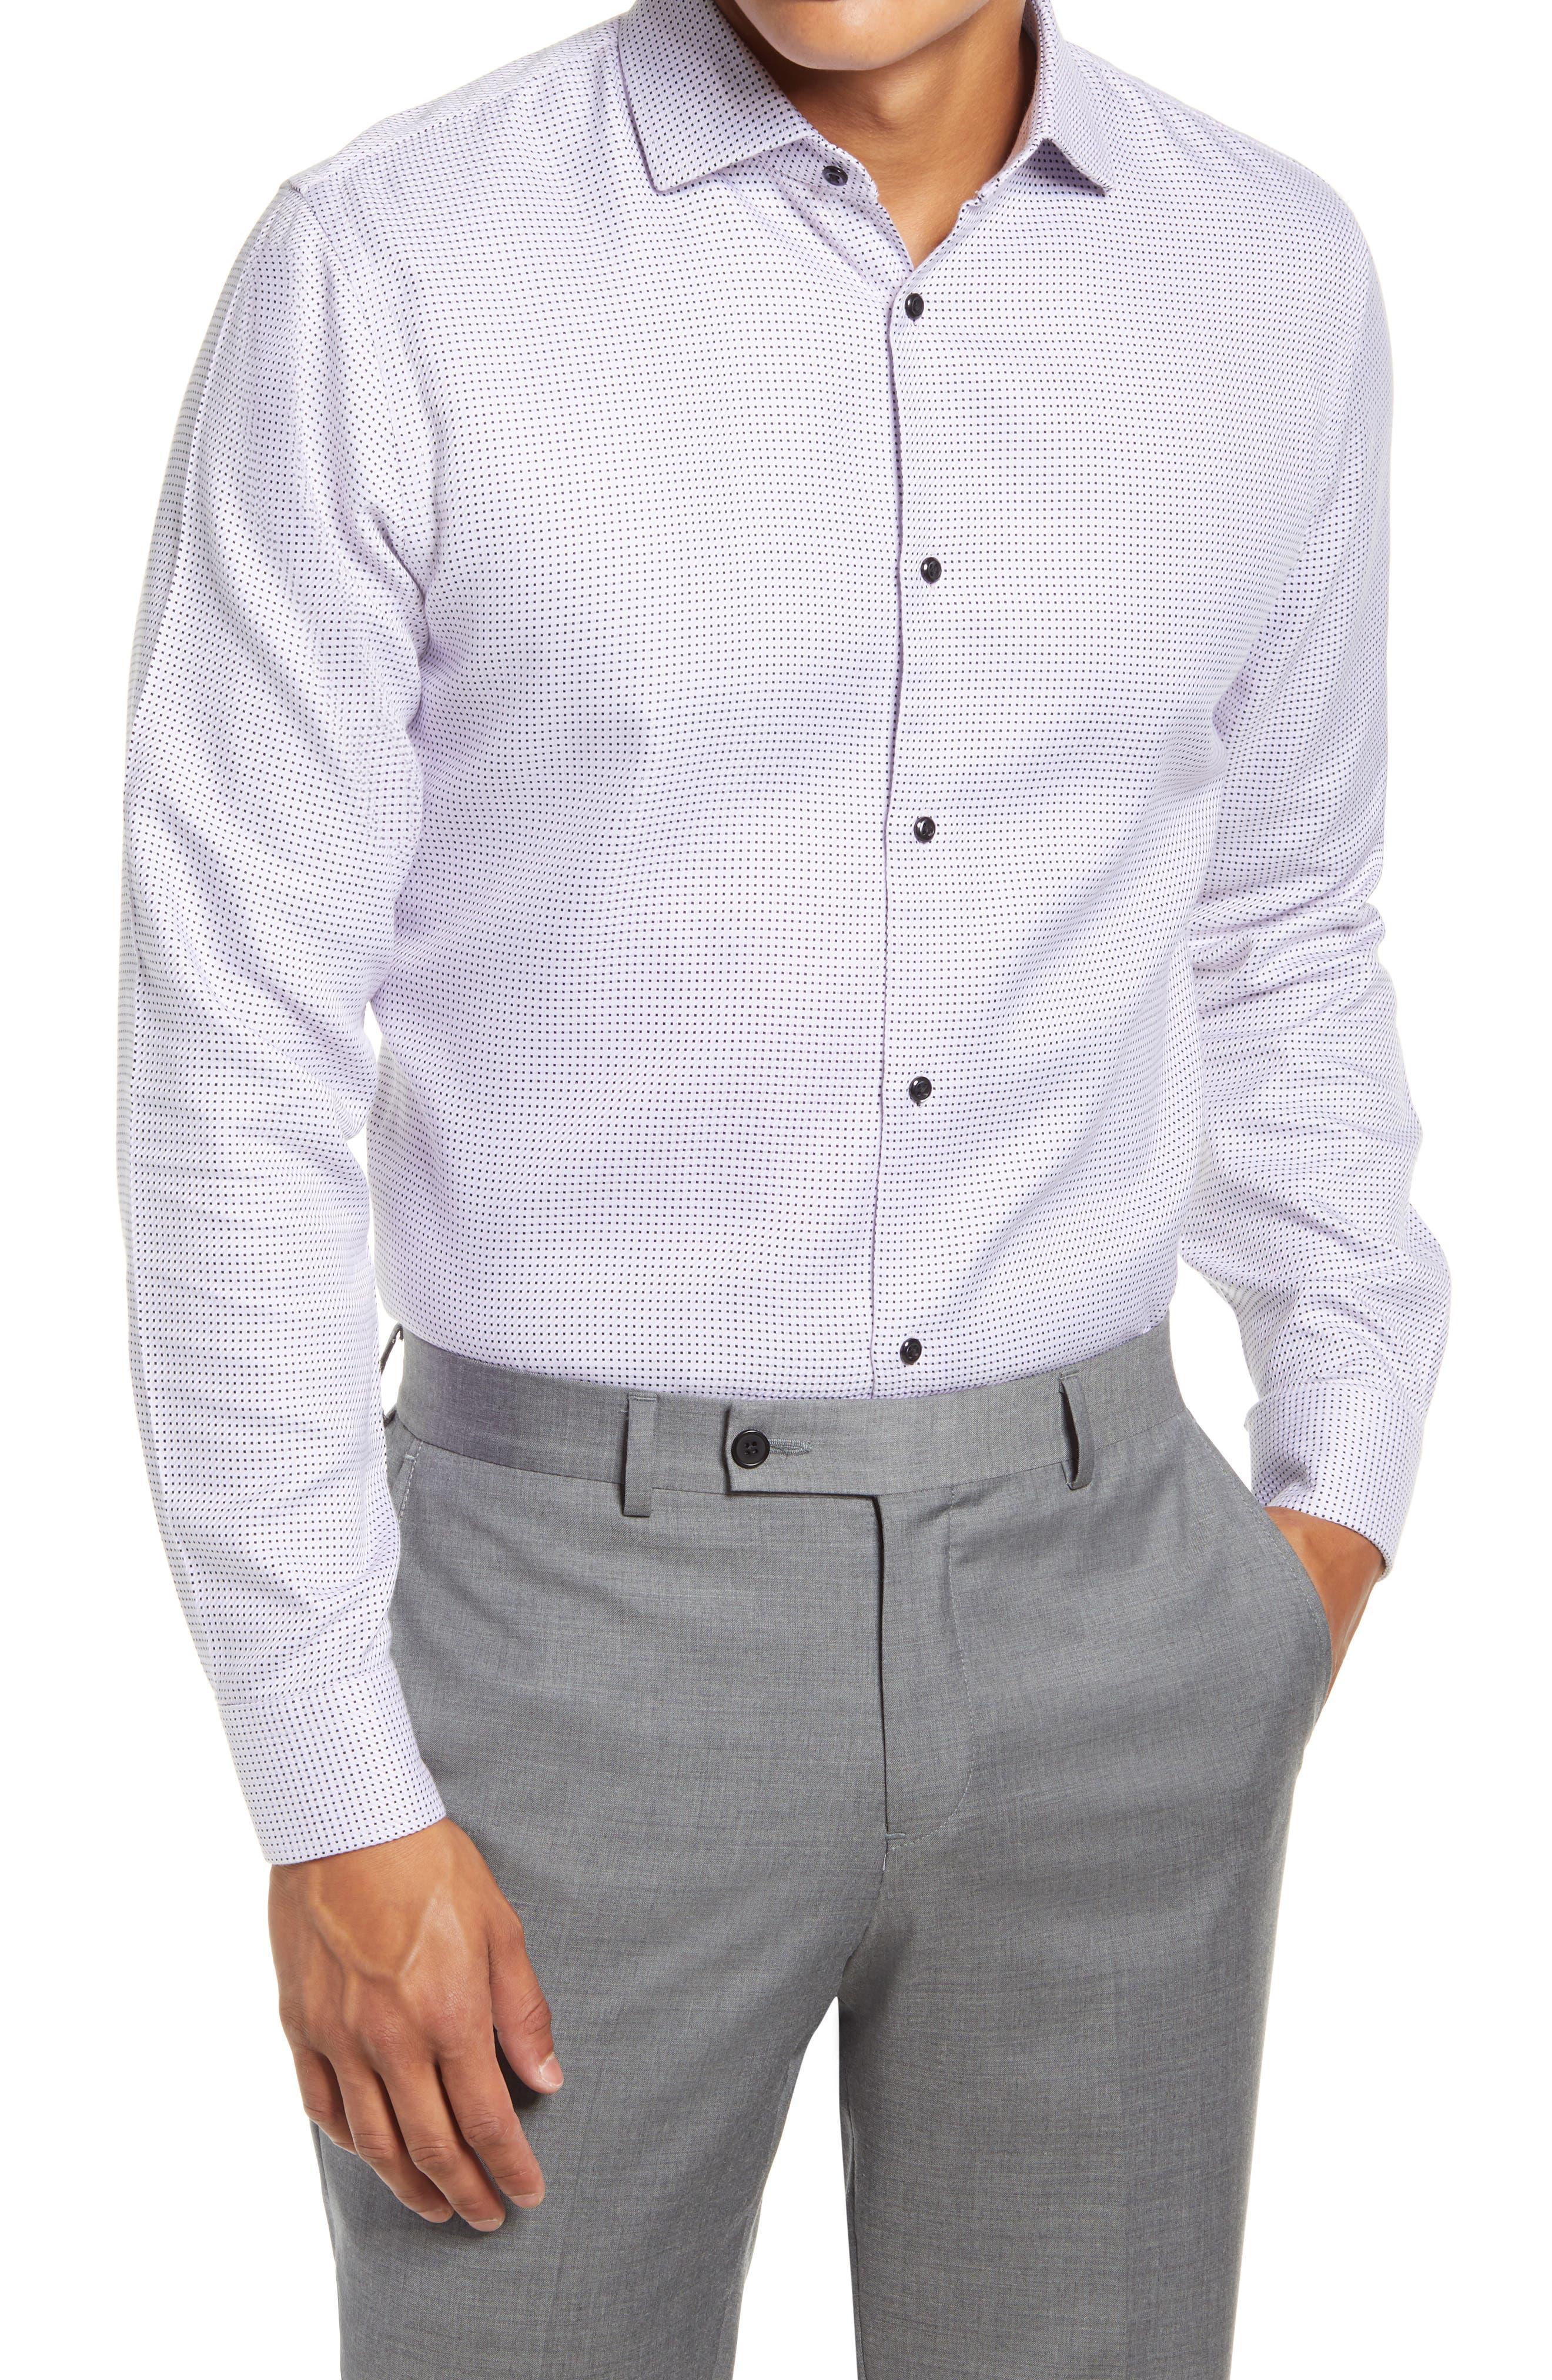 Image of NORDSTROM MEN'S SHOP Trim Fit Non-Iron Stretch Dress Shirt